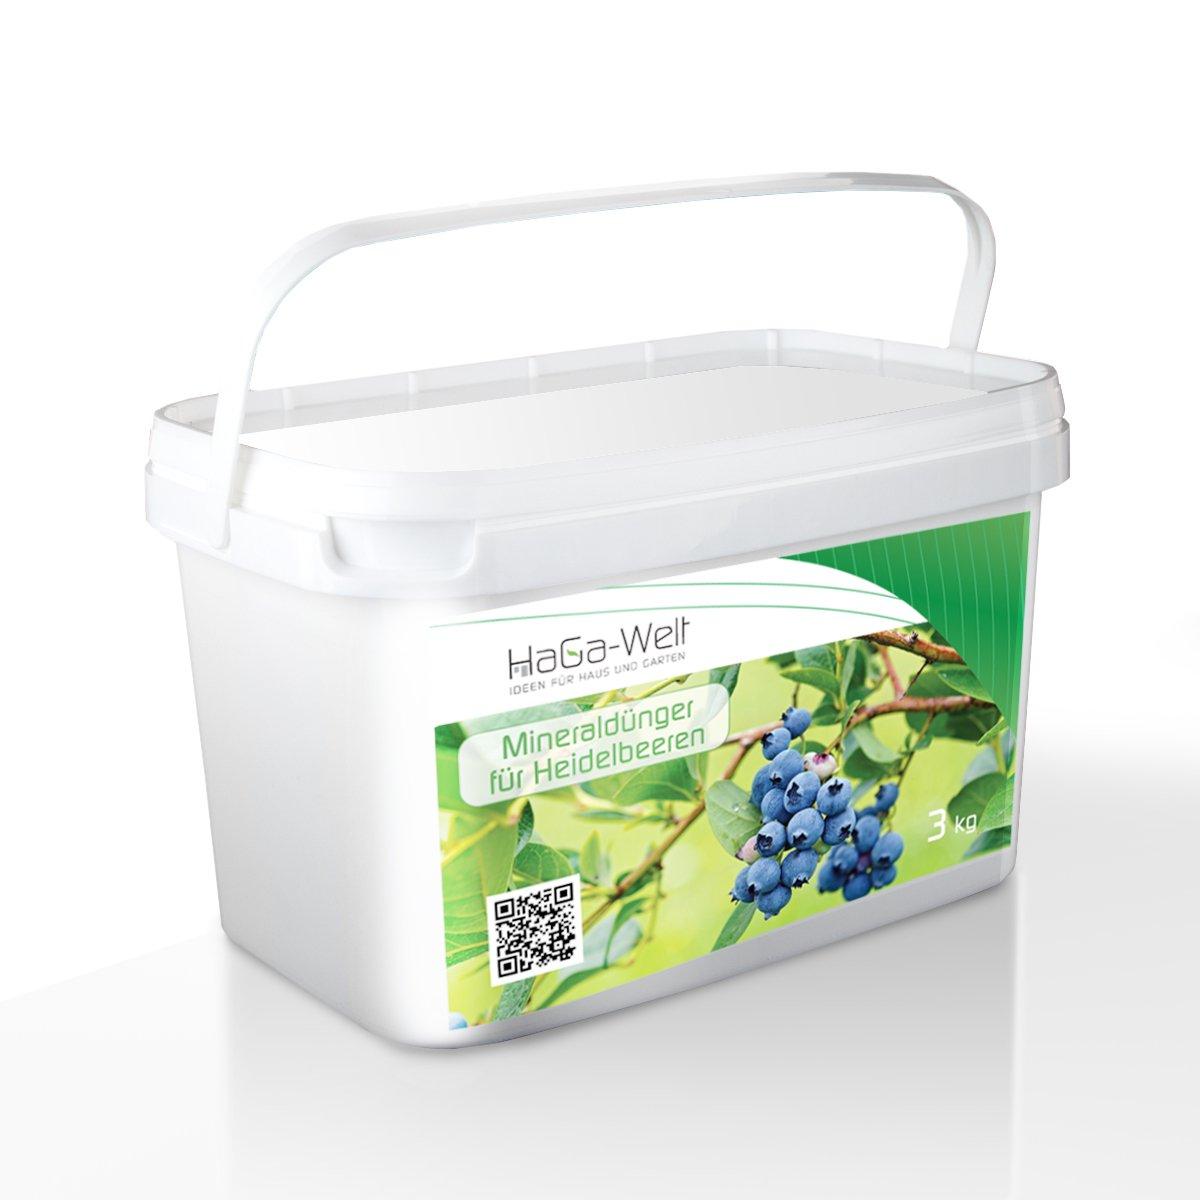 CONCIME MINERALE PER Mirtilli CONCIME FERTILIZZANTE PER PIANTE DA FRUTTO delle Piante fertilizzante 3kg Planta